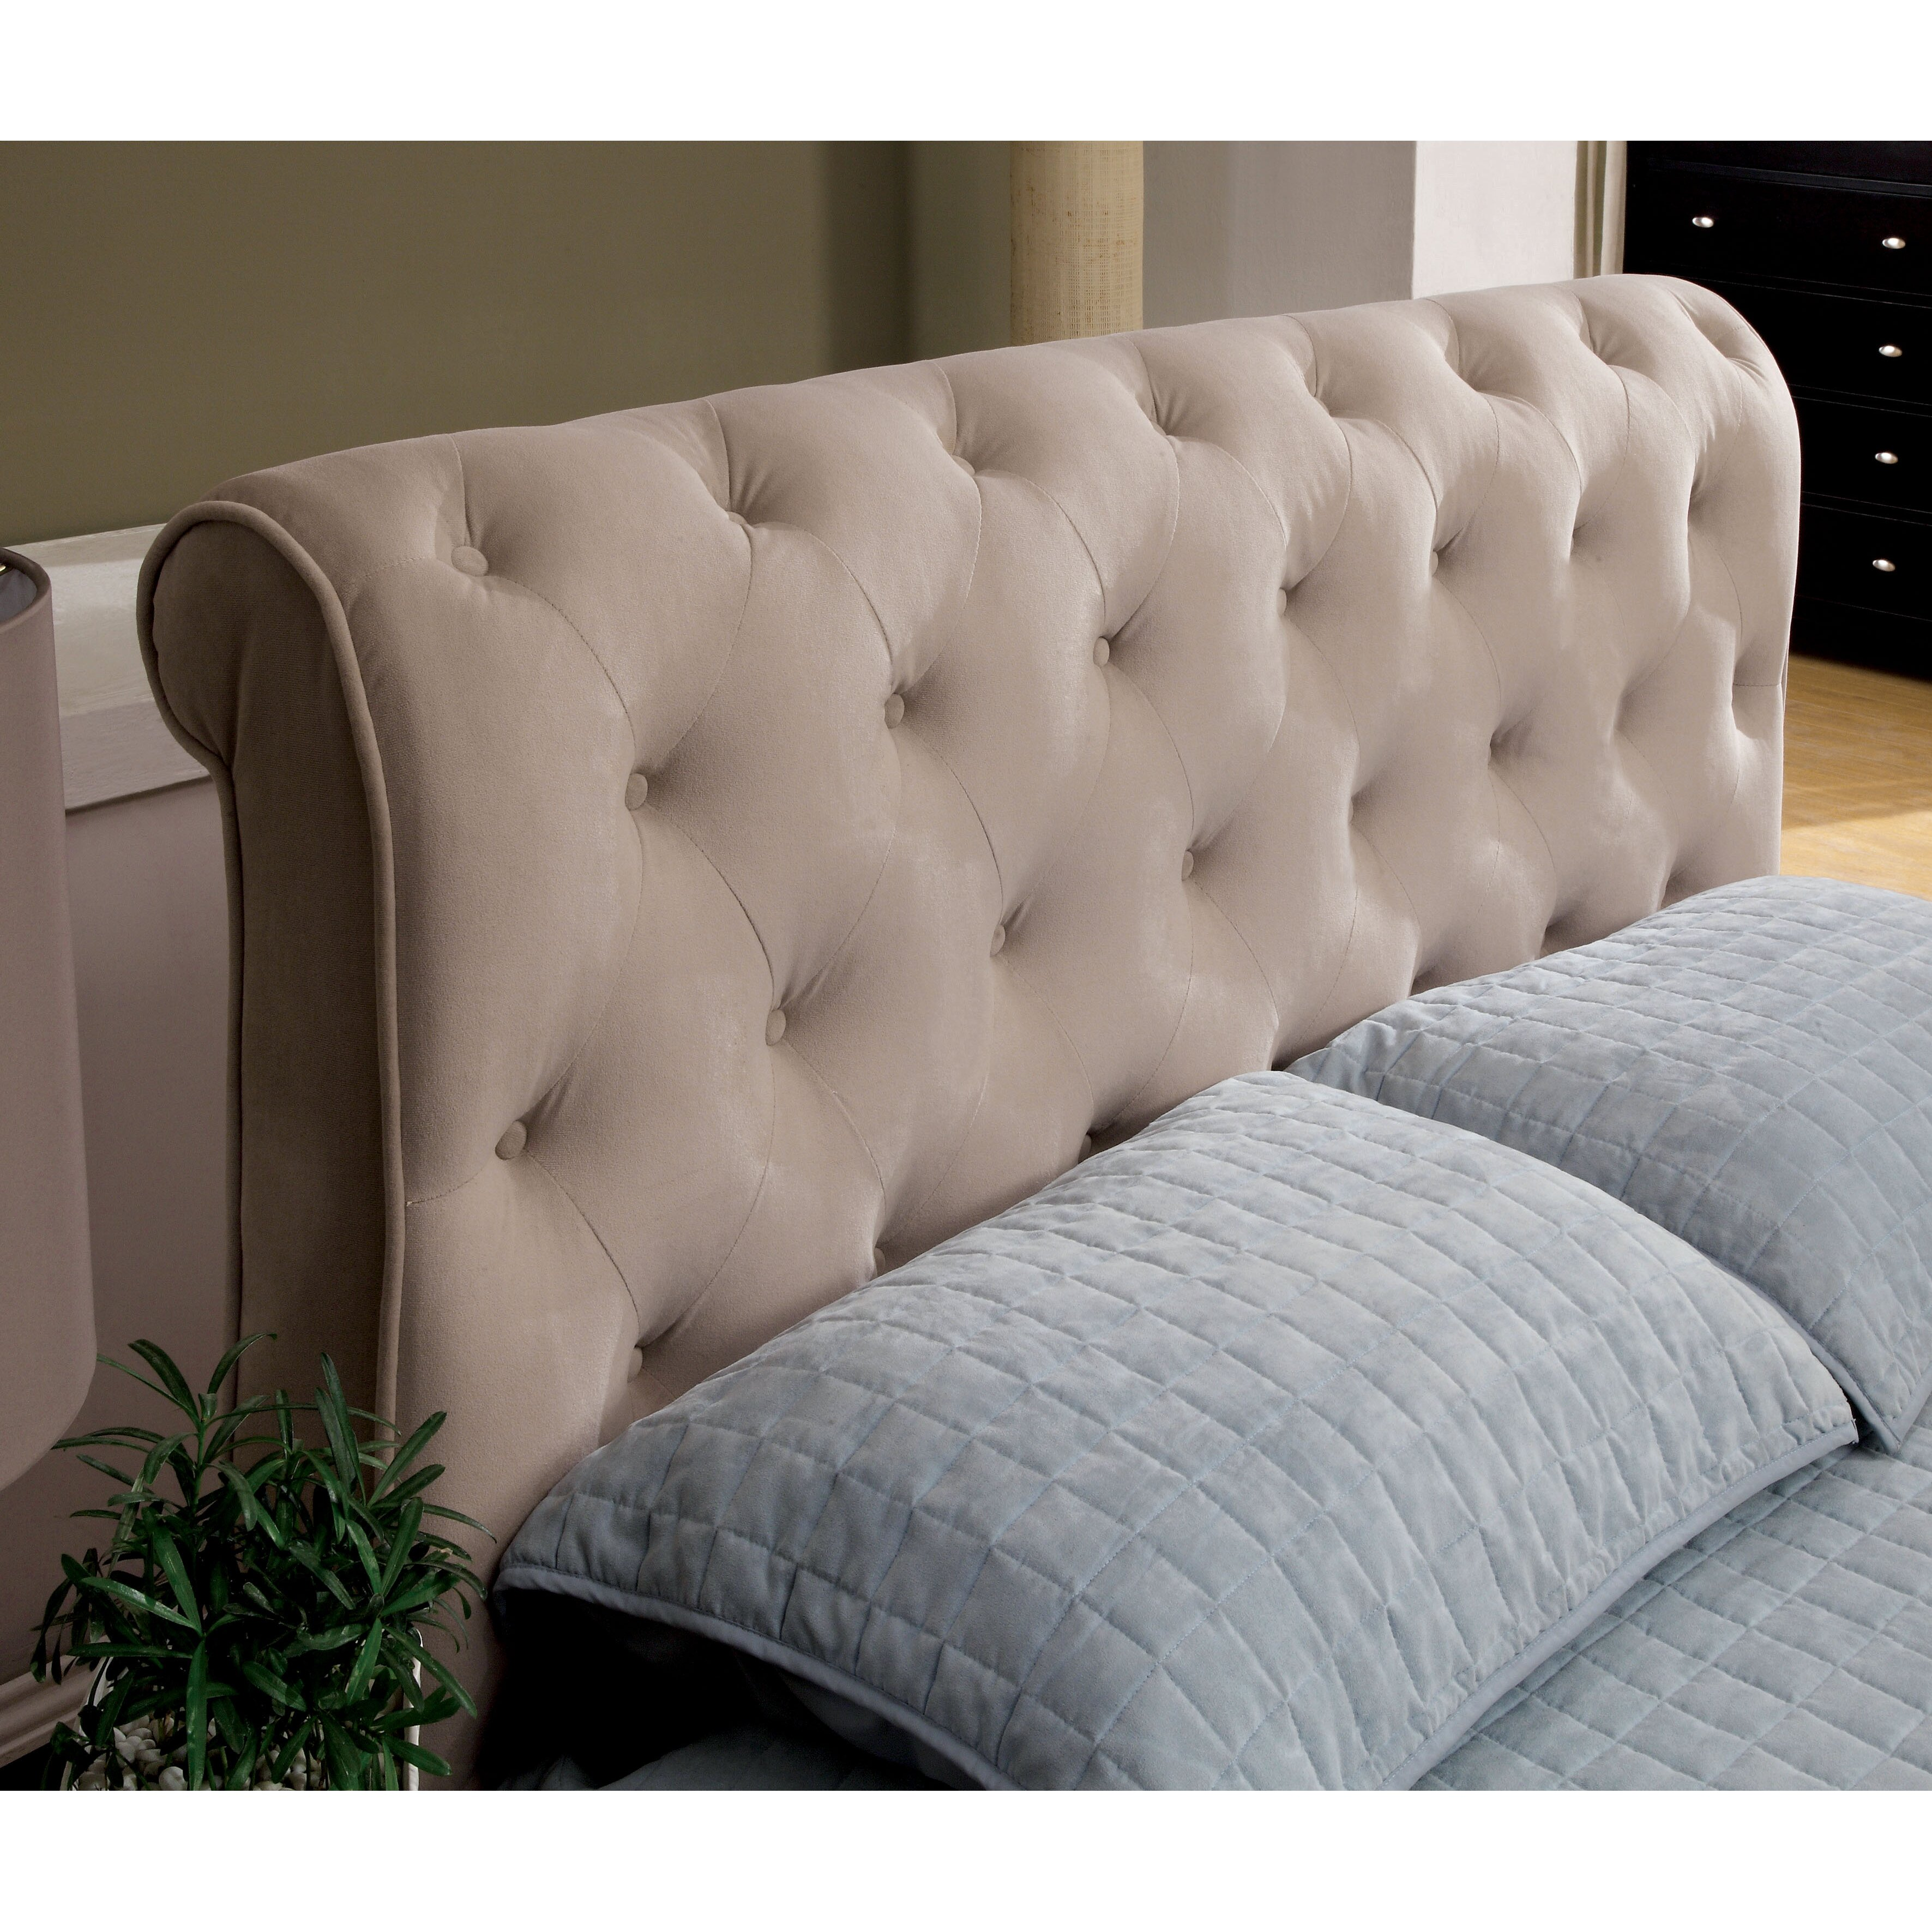 How to cover a headboard - Hokku Designs Concord Upholstered Sleigh Headboard